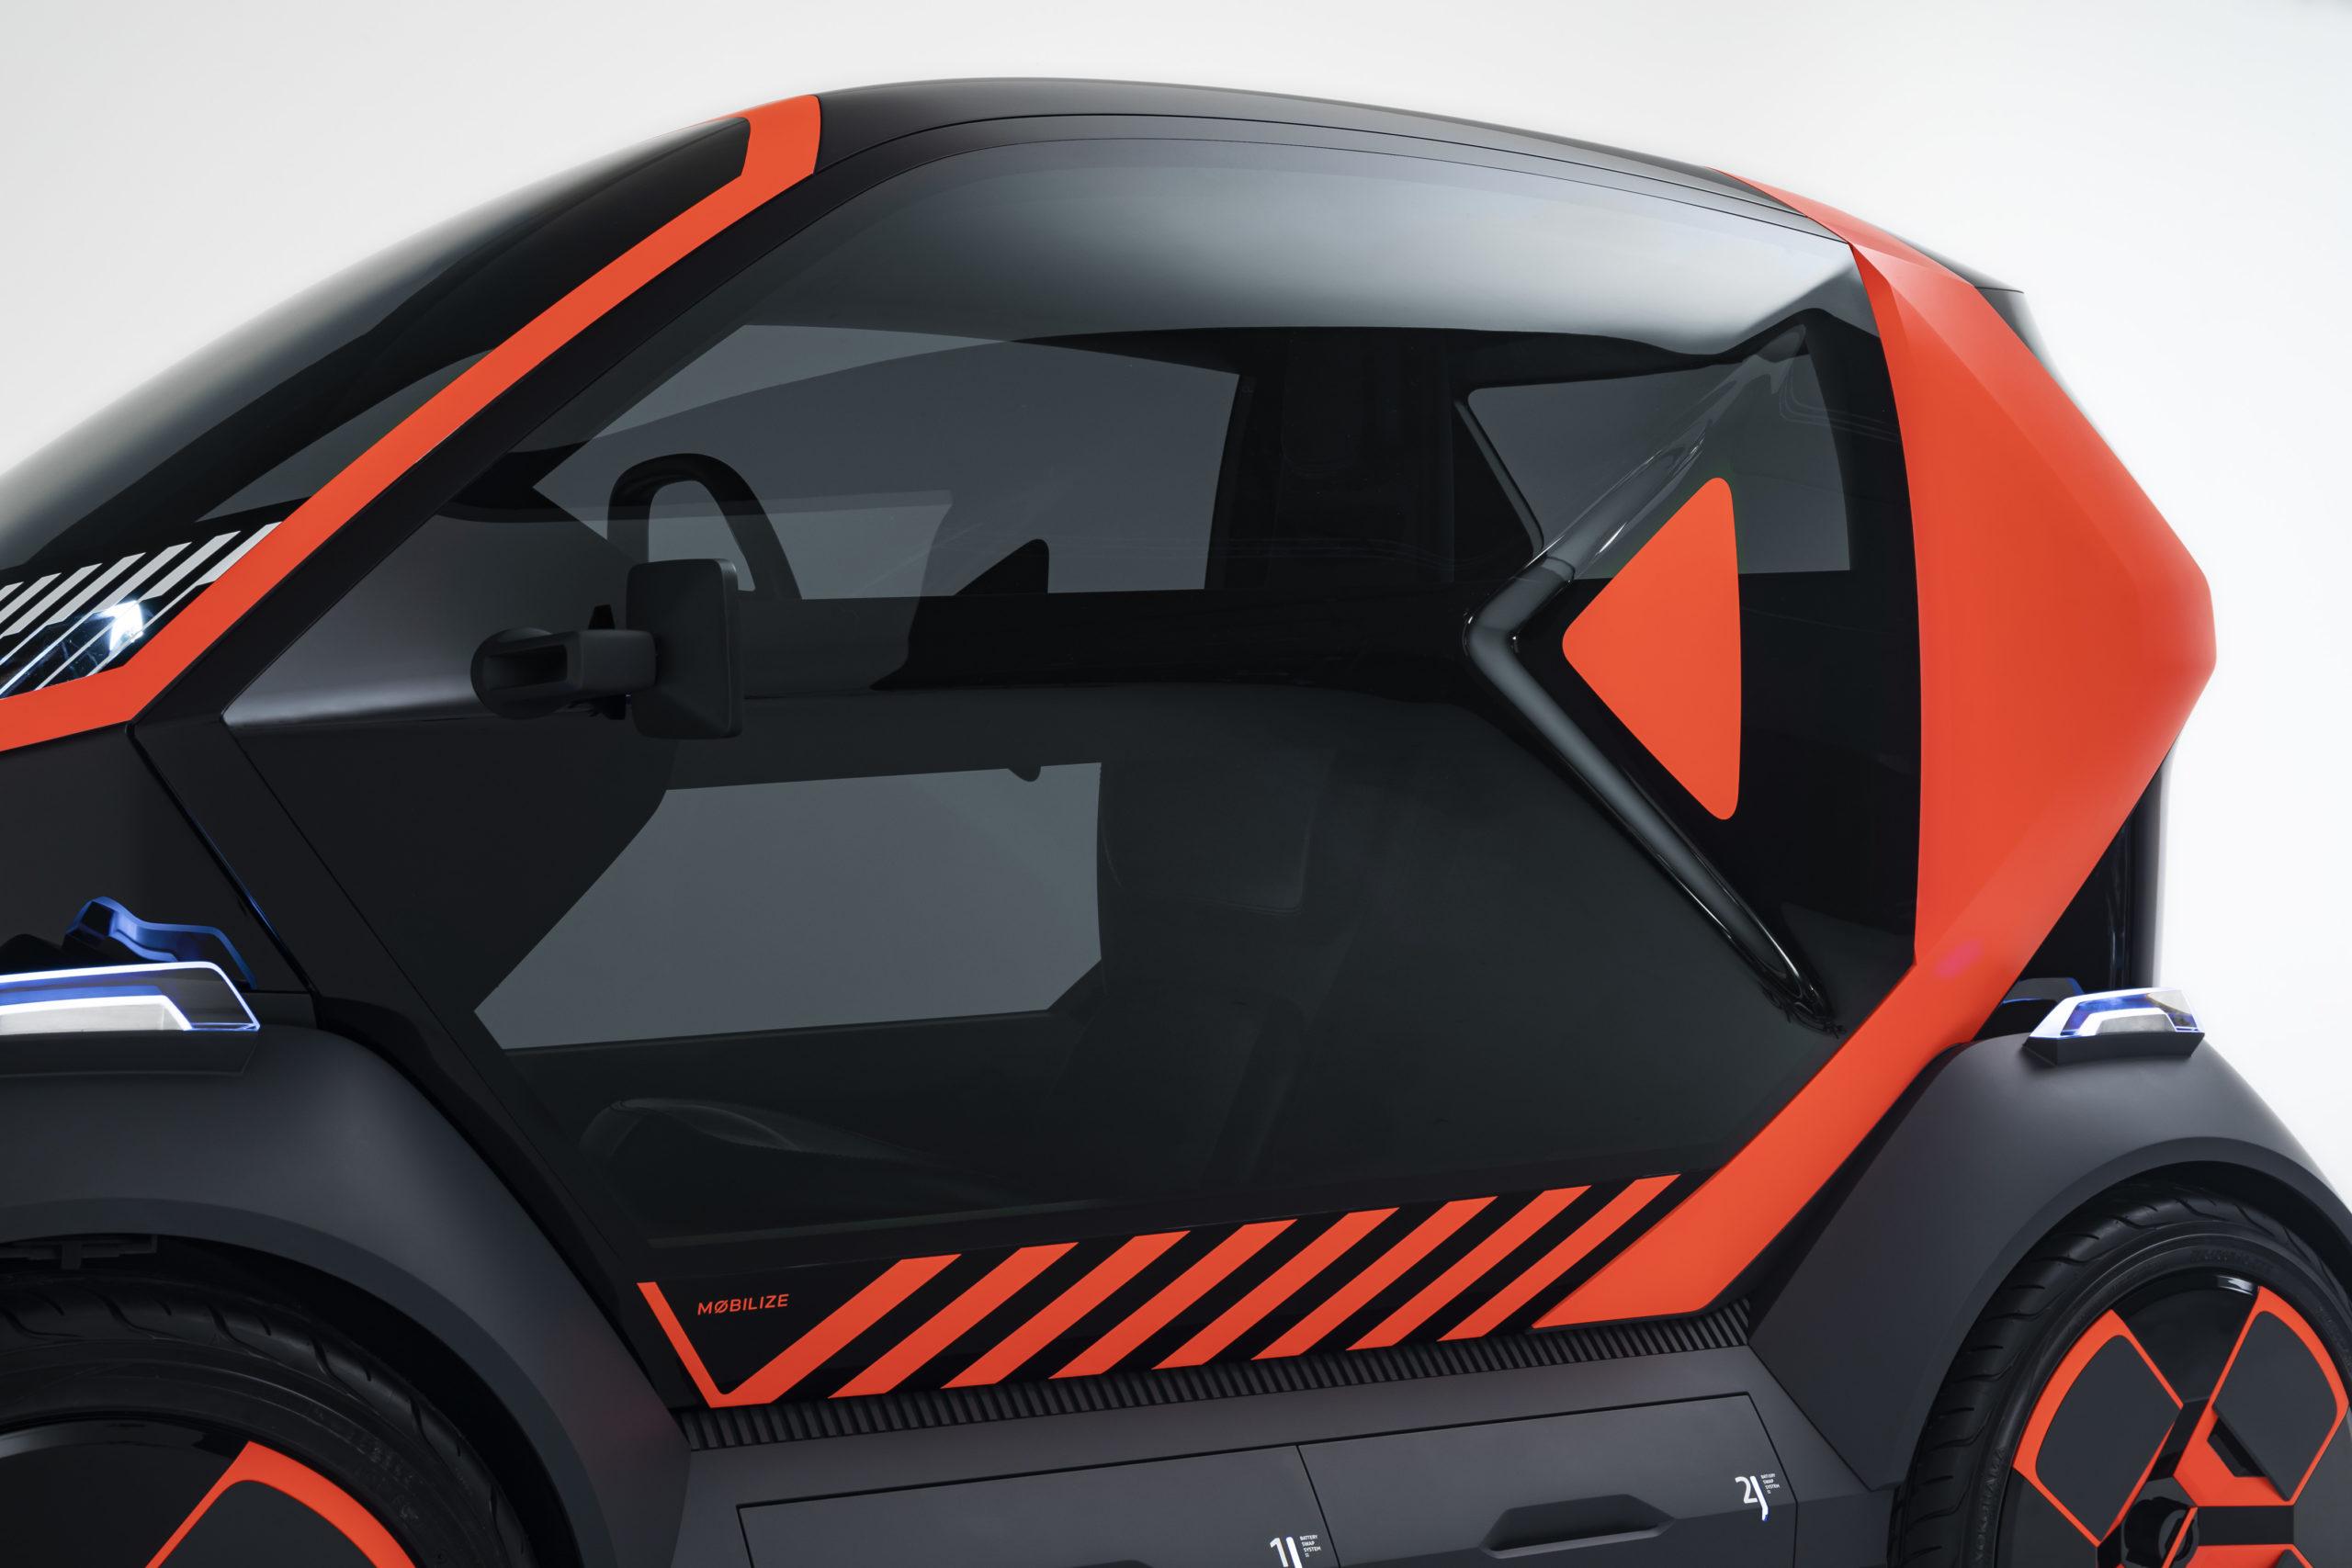 mobilize_ez_1_prototype_electric_motor_news_10